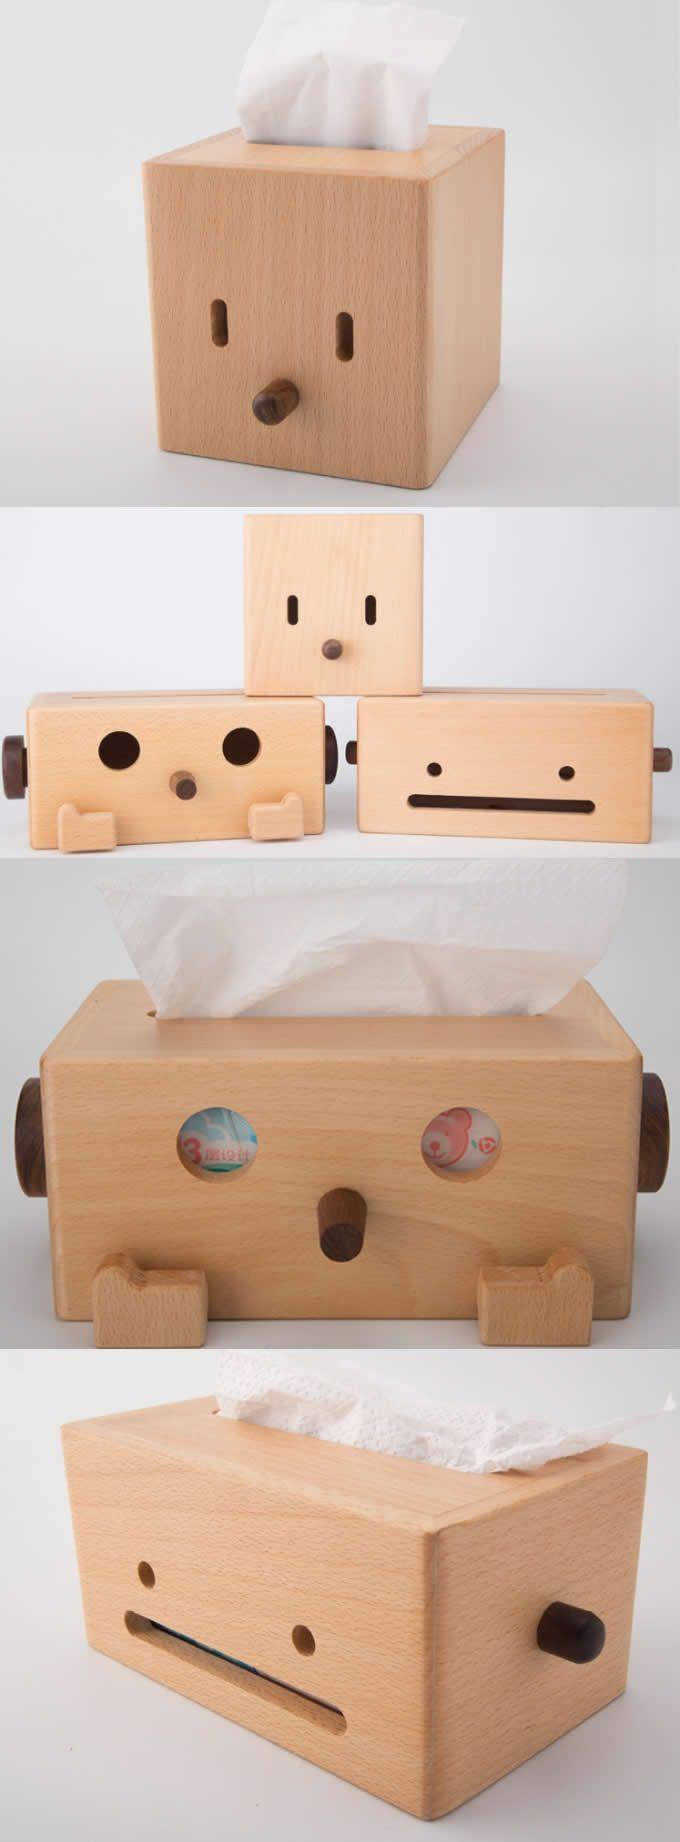 wooden robot transformers desk tissue box cover tissue box holder